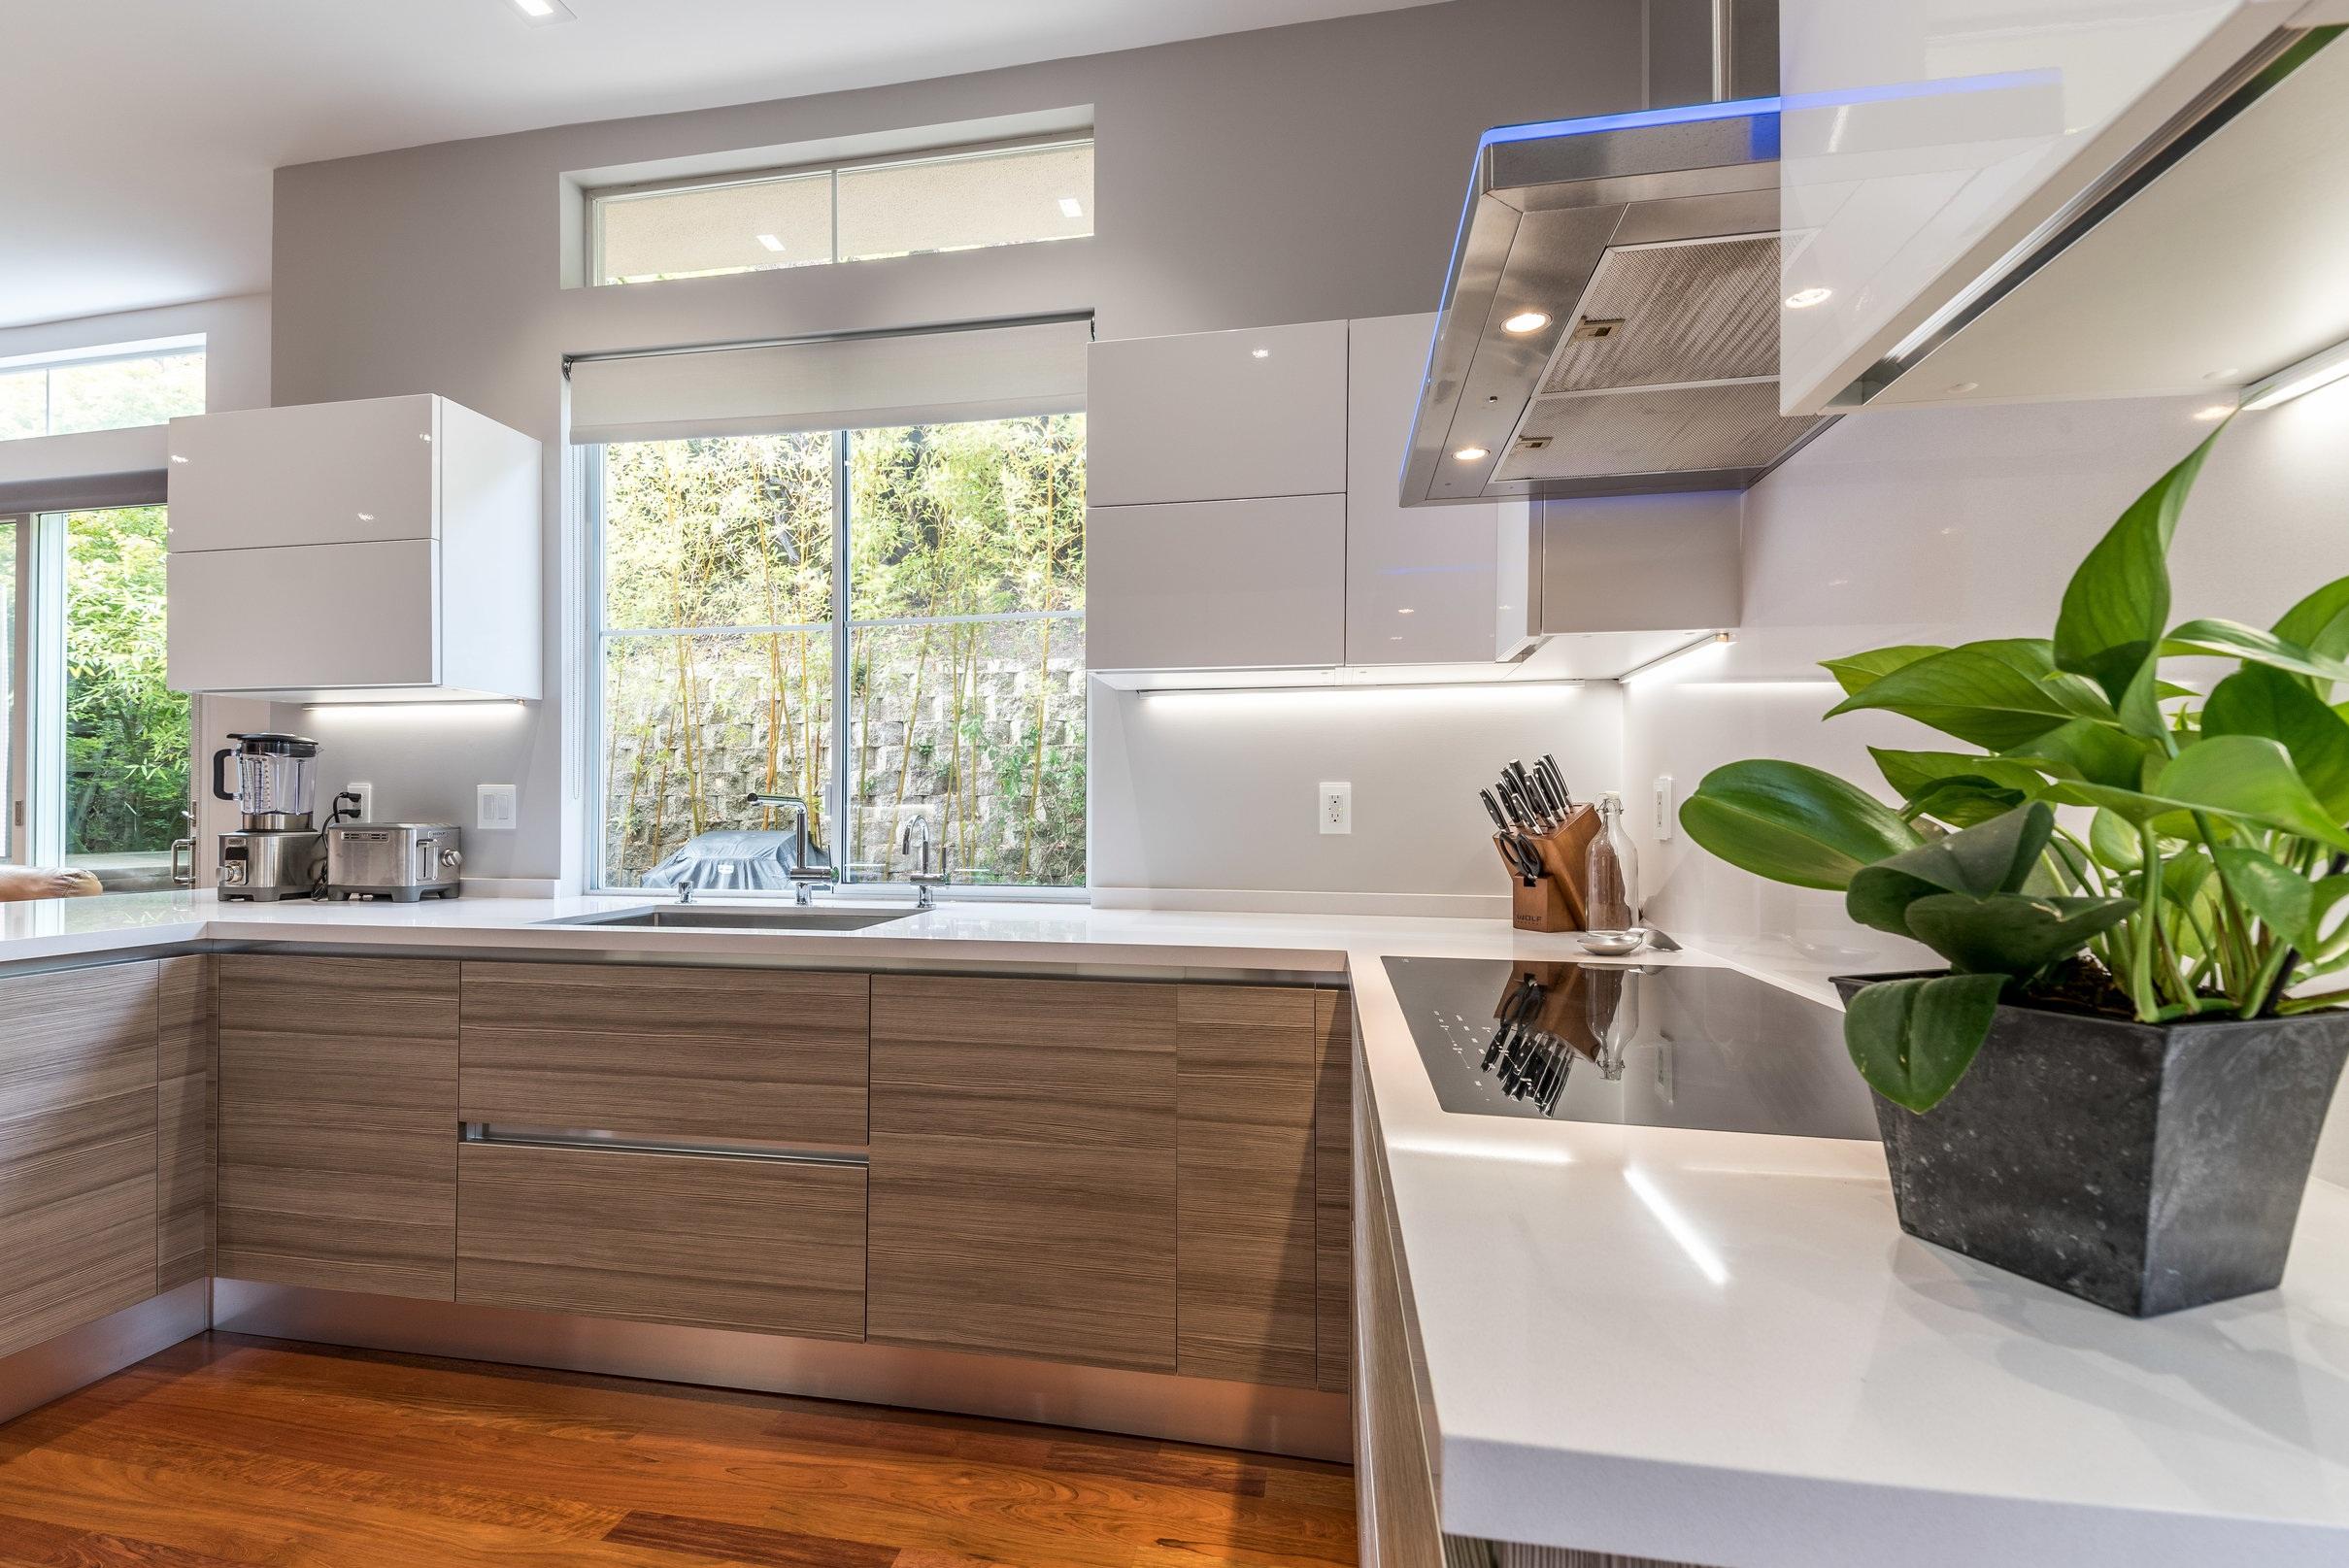 Kitchen Remodeling -